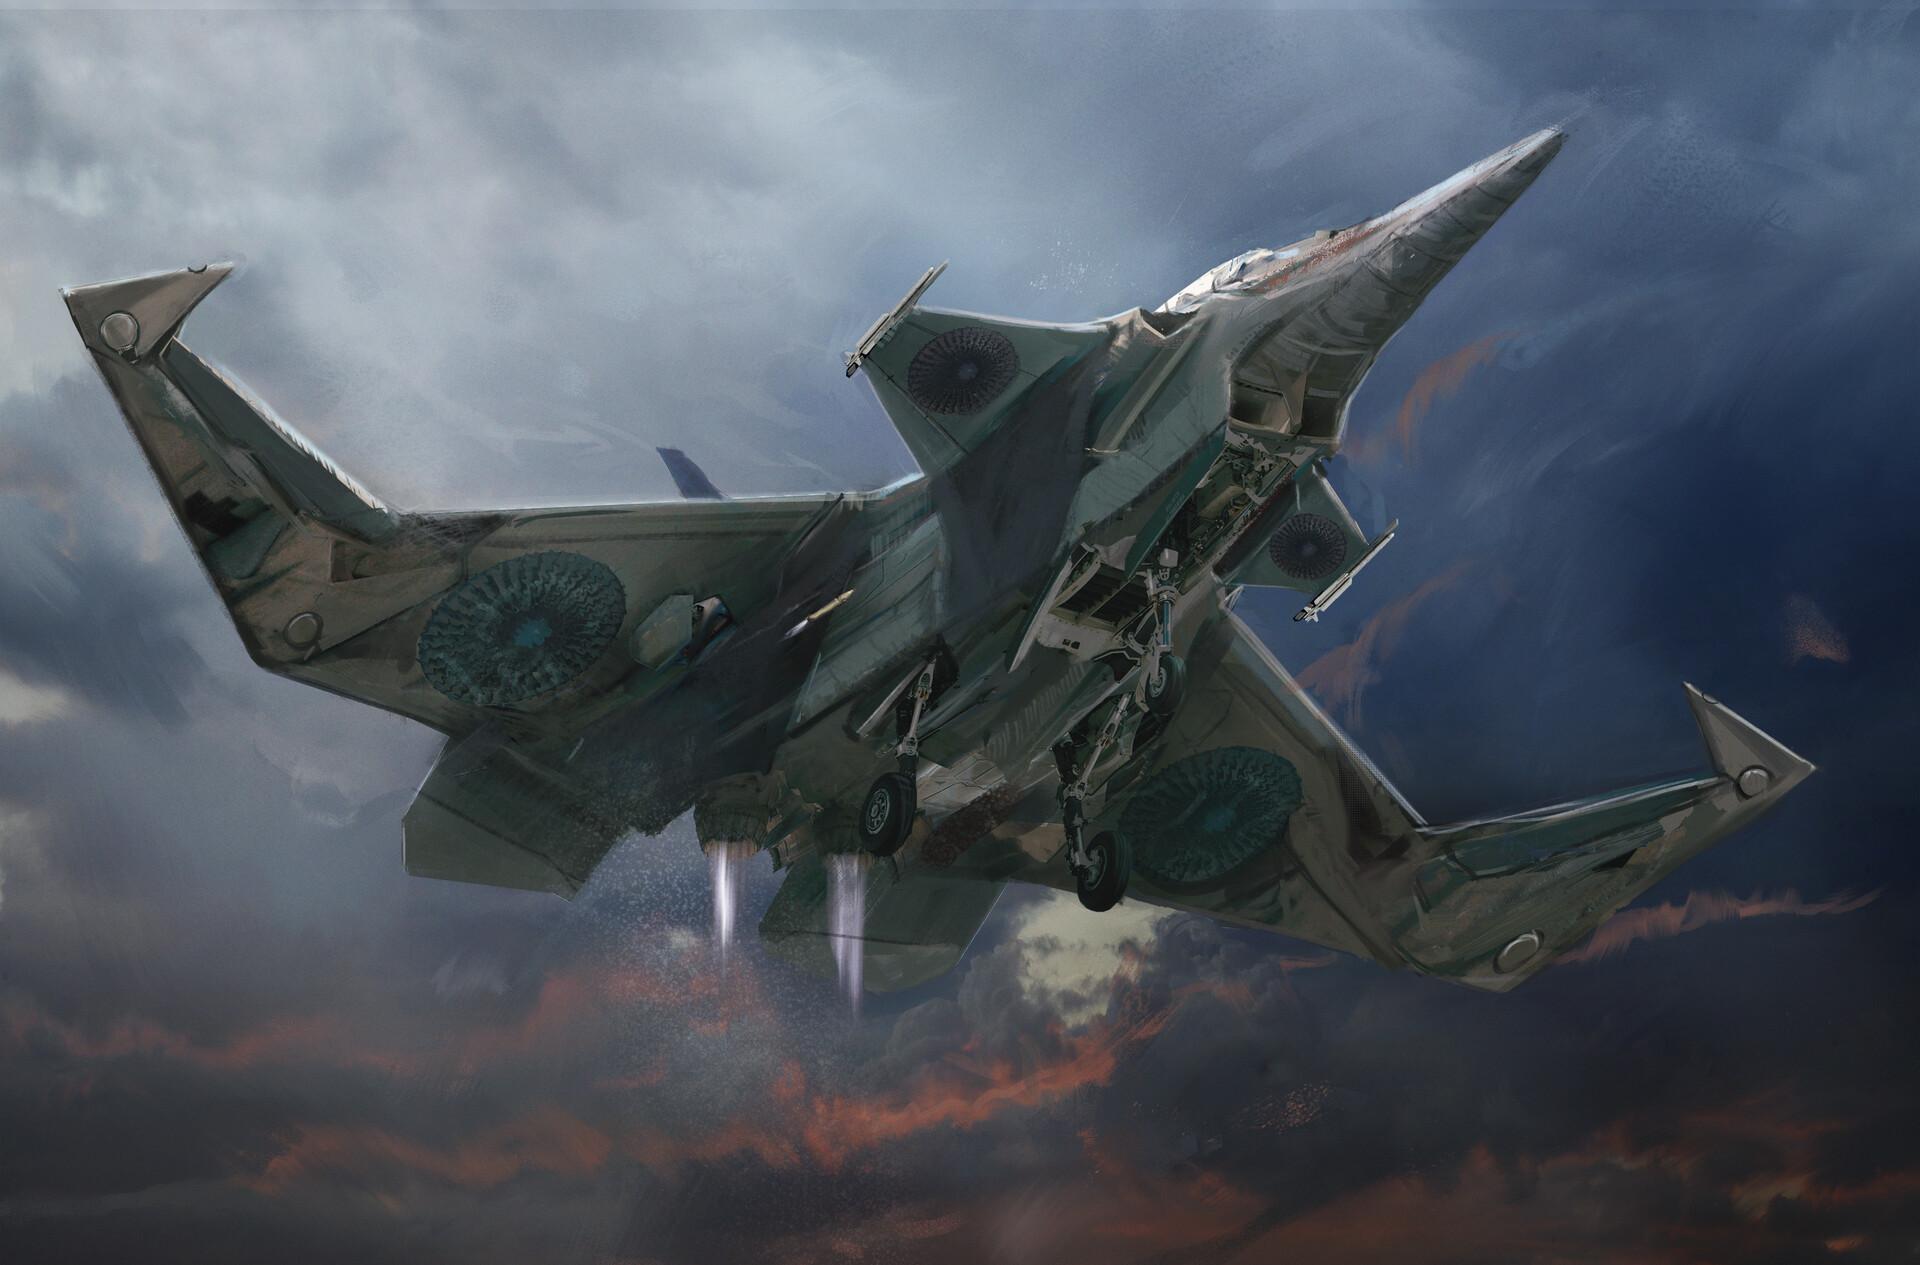 David tilton dti vanguard fighterjet bottom sketch a09